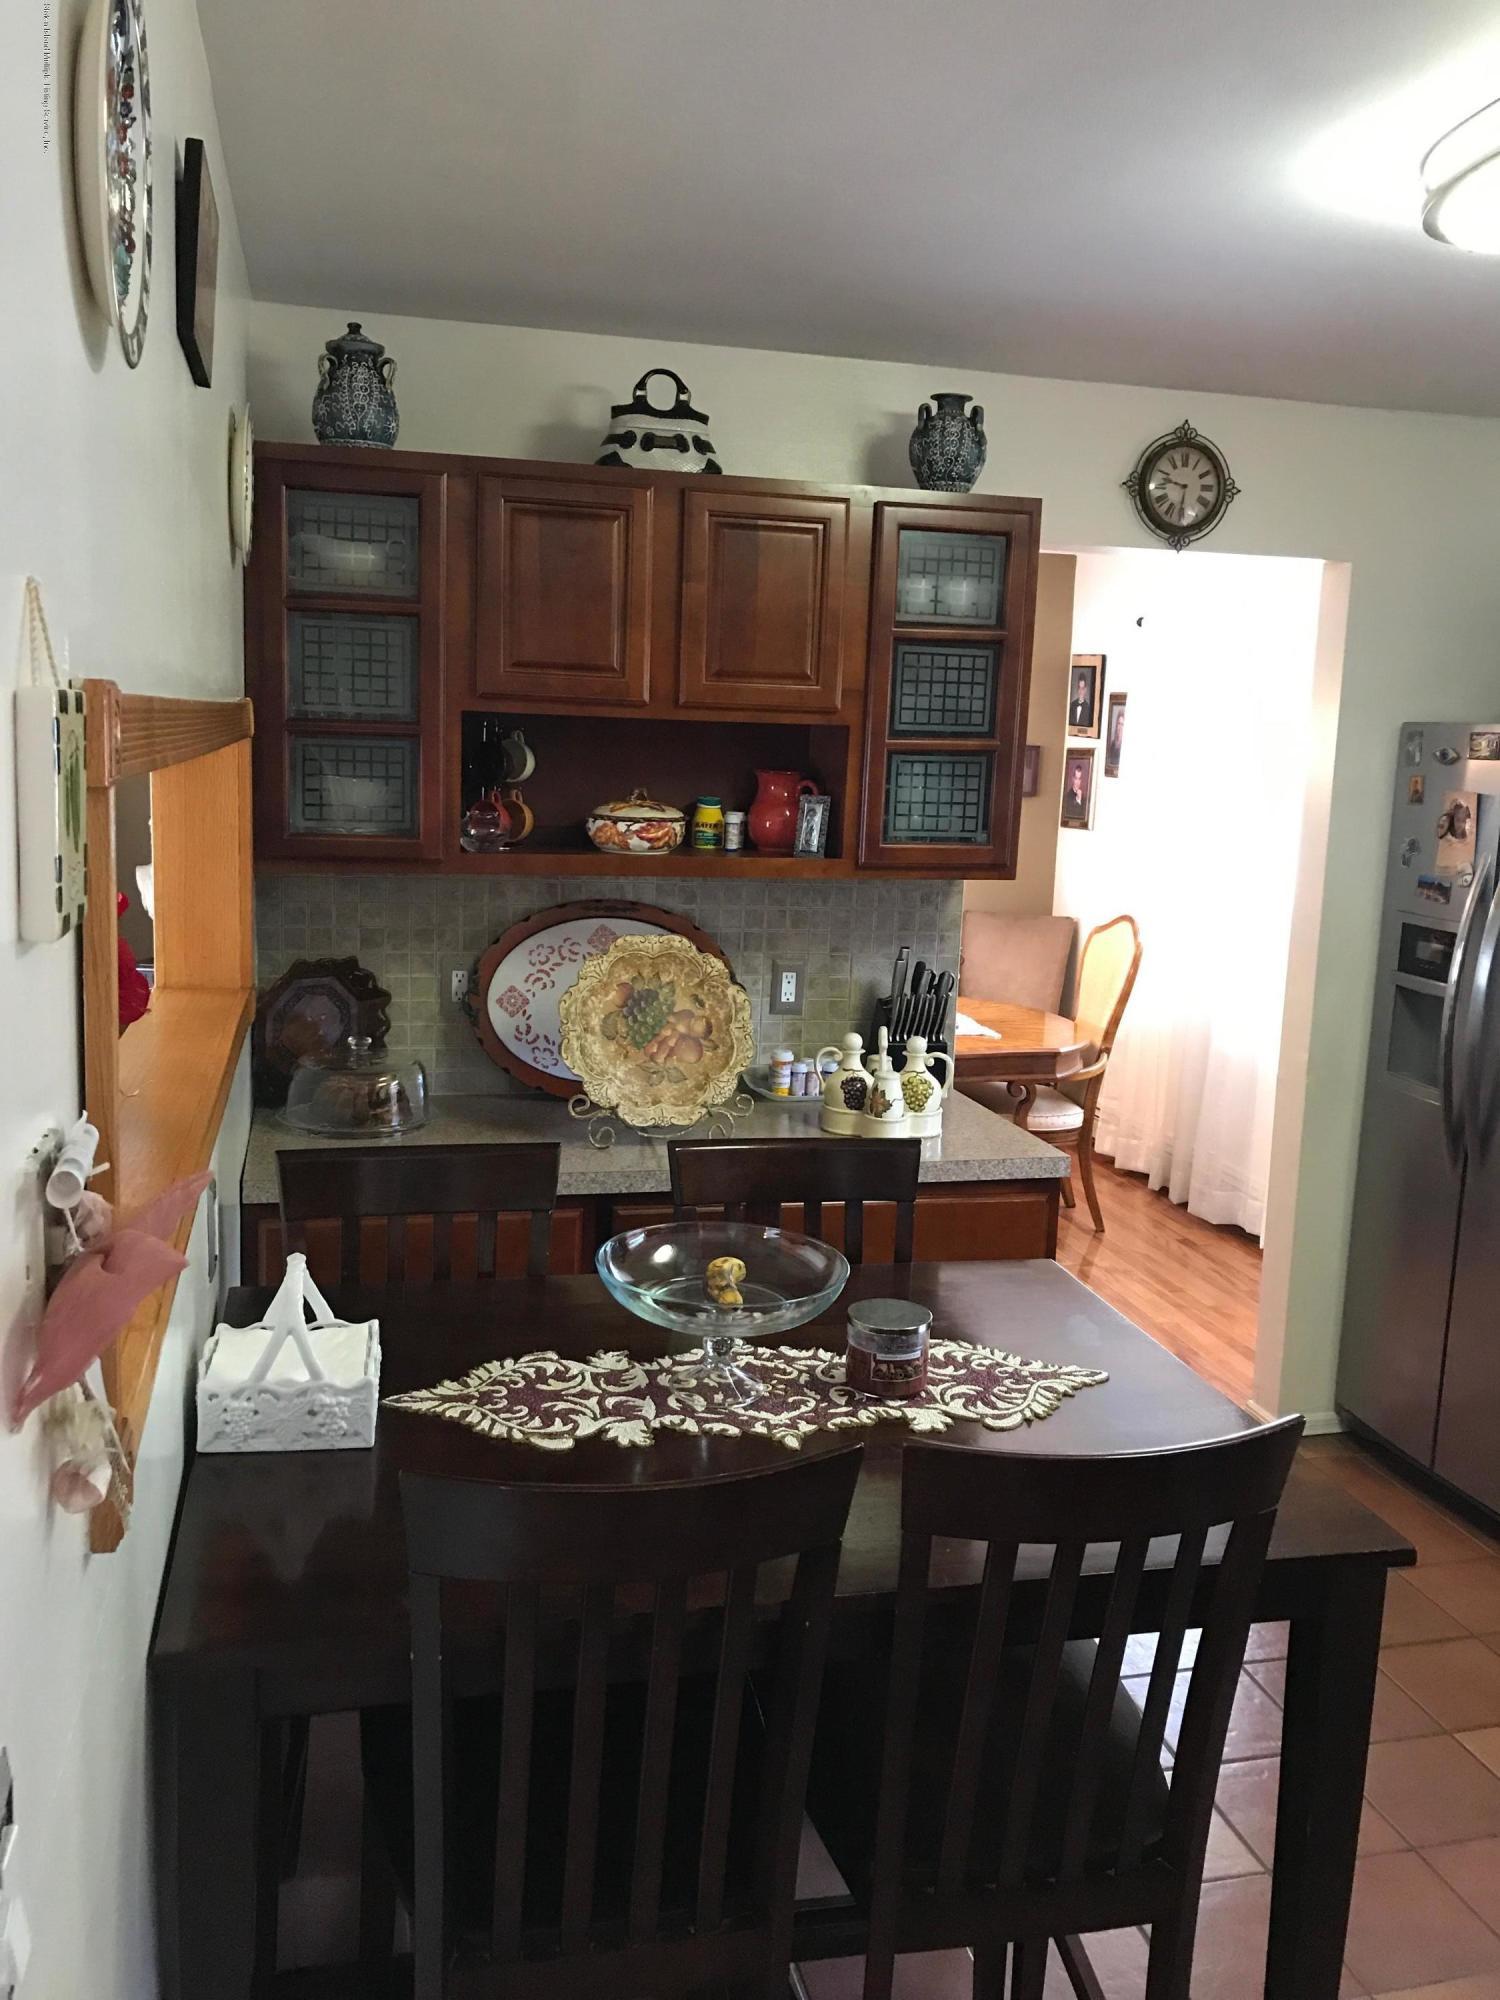 34 Isernia Avenue,Staten Island,New York,10306,United States,3 Bedrooms Bedrooms,6 Rooms Rooms,3 BathroomsBathrooms,Residential,Isernia,1124446